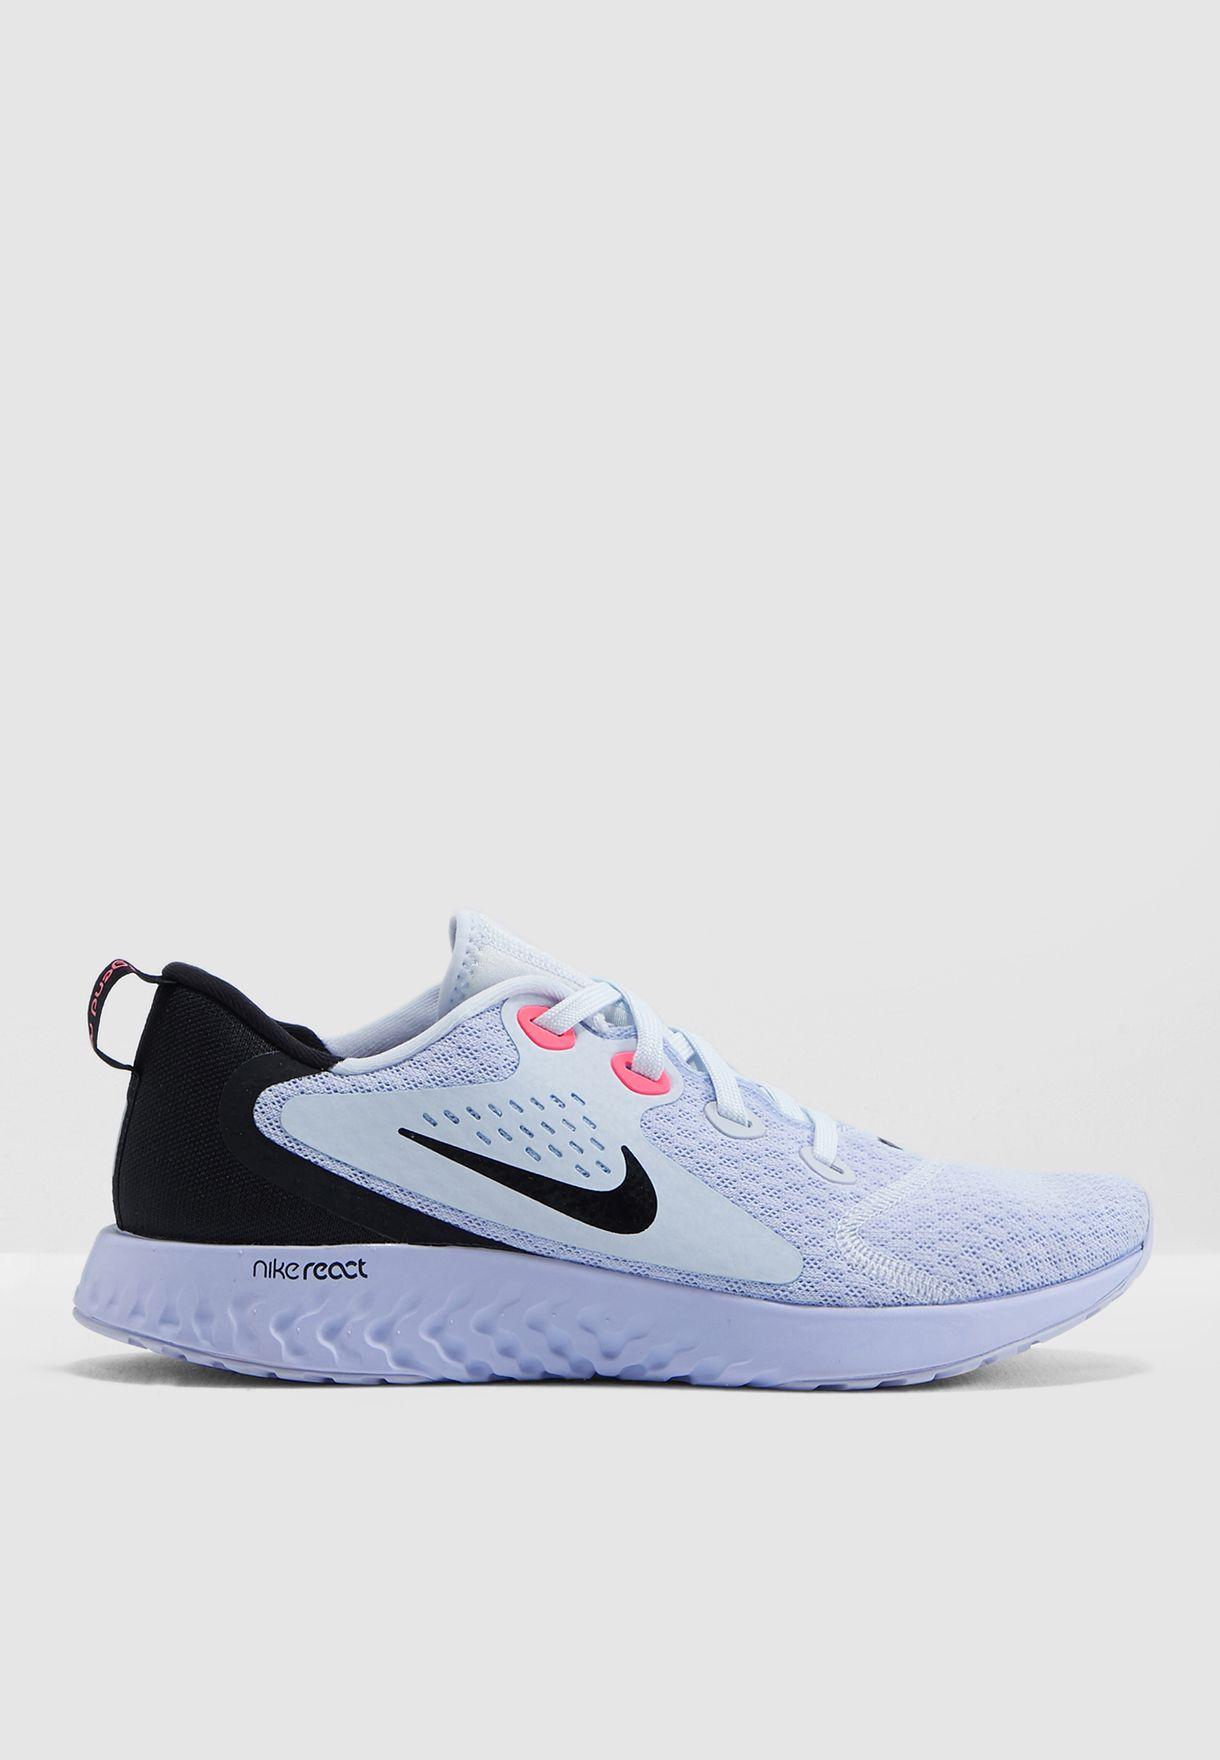 4868ee0a973c9 Nike Wmns Legend React - SPORT SHOES RUNNING SHOES - Superfanas.lt